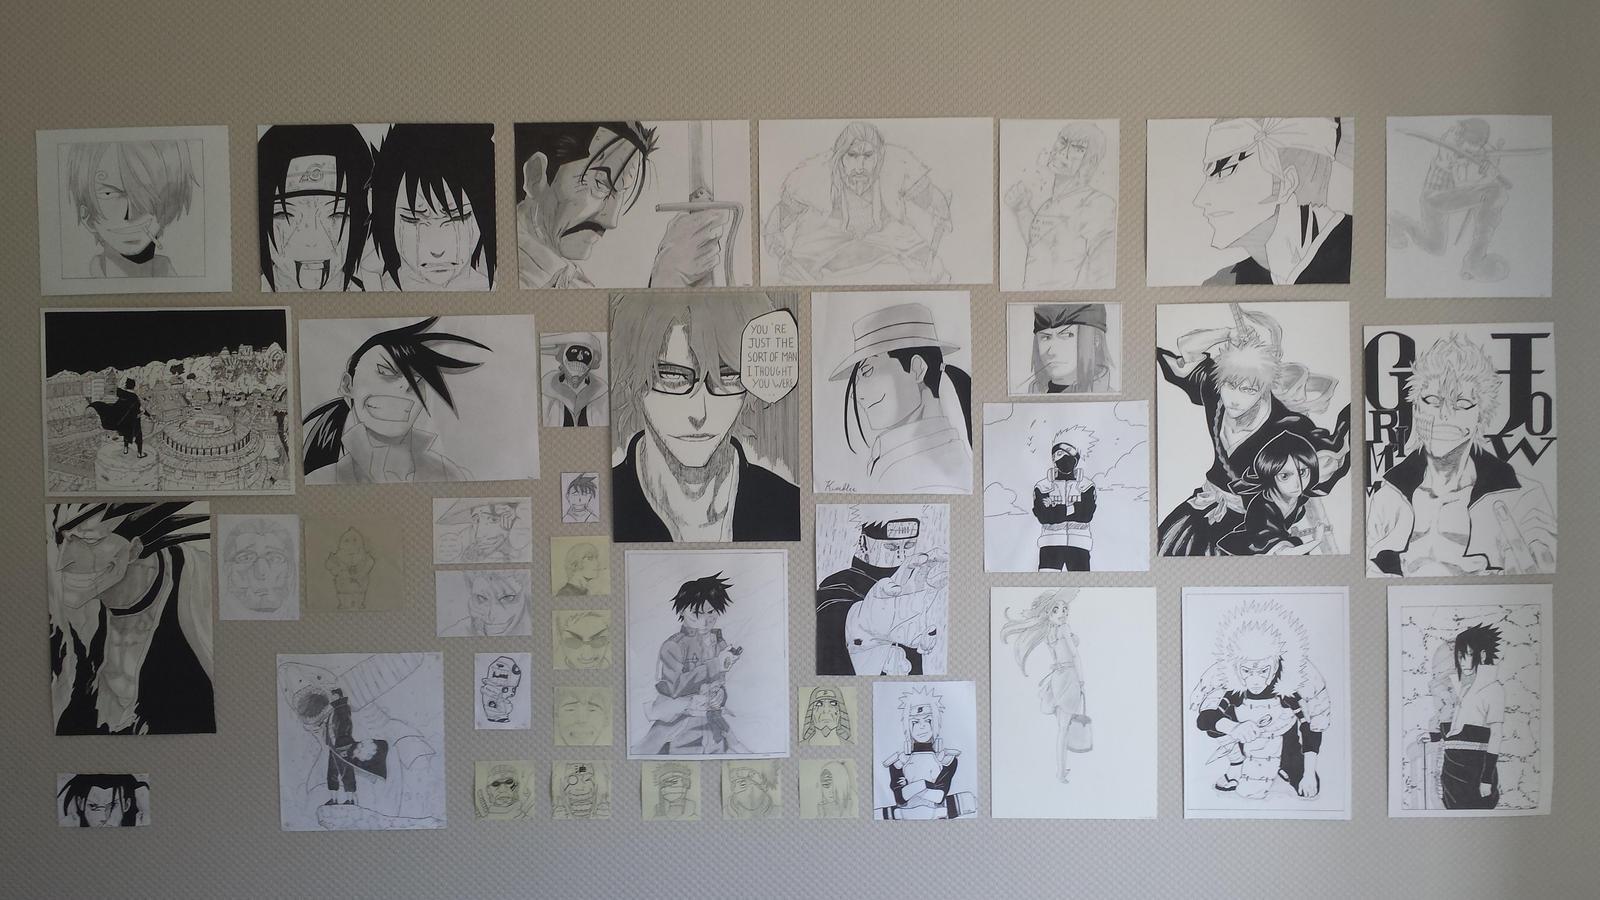 Wall Manga Drawing By Leboubou On Deviantart